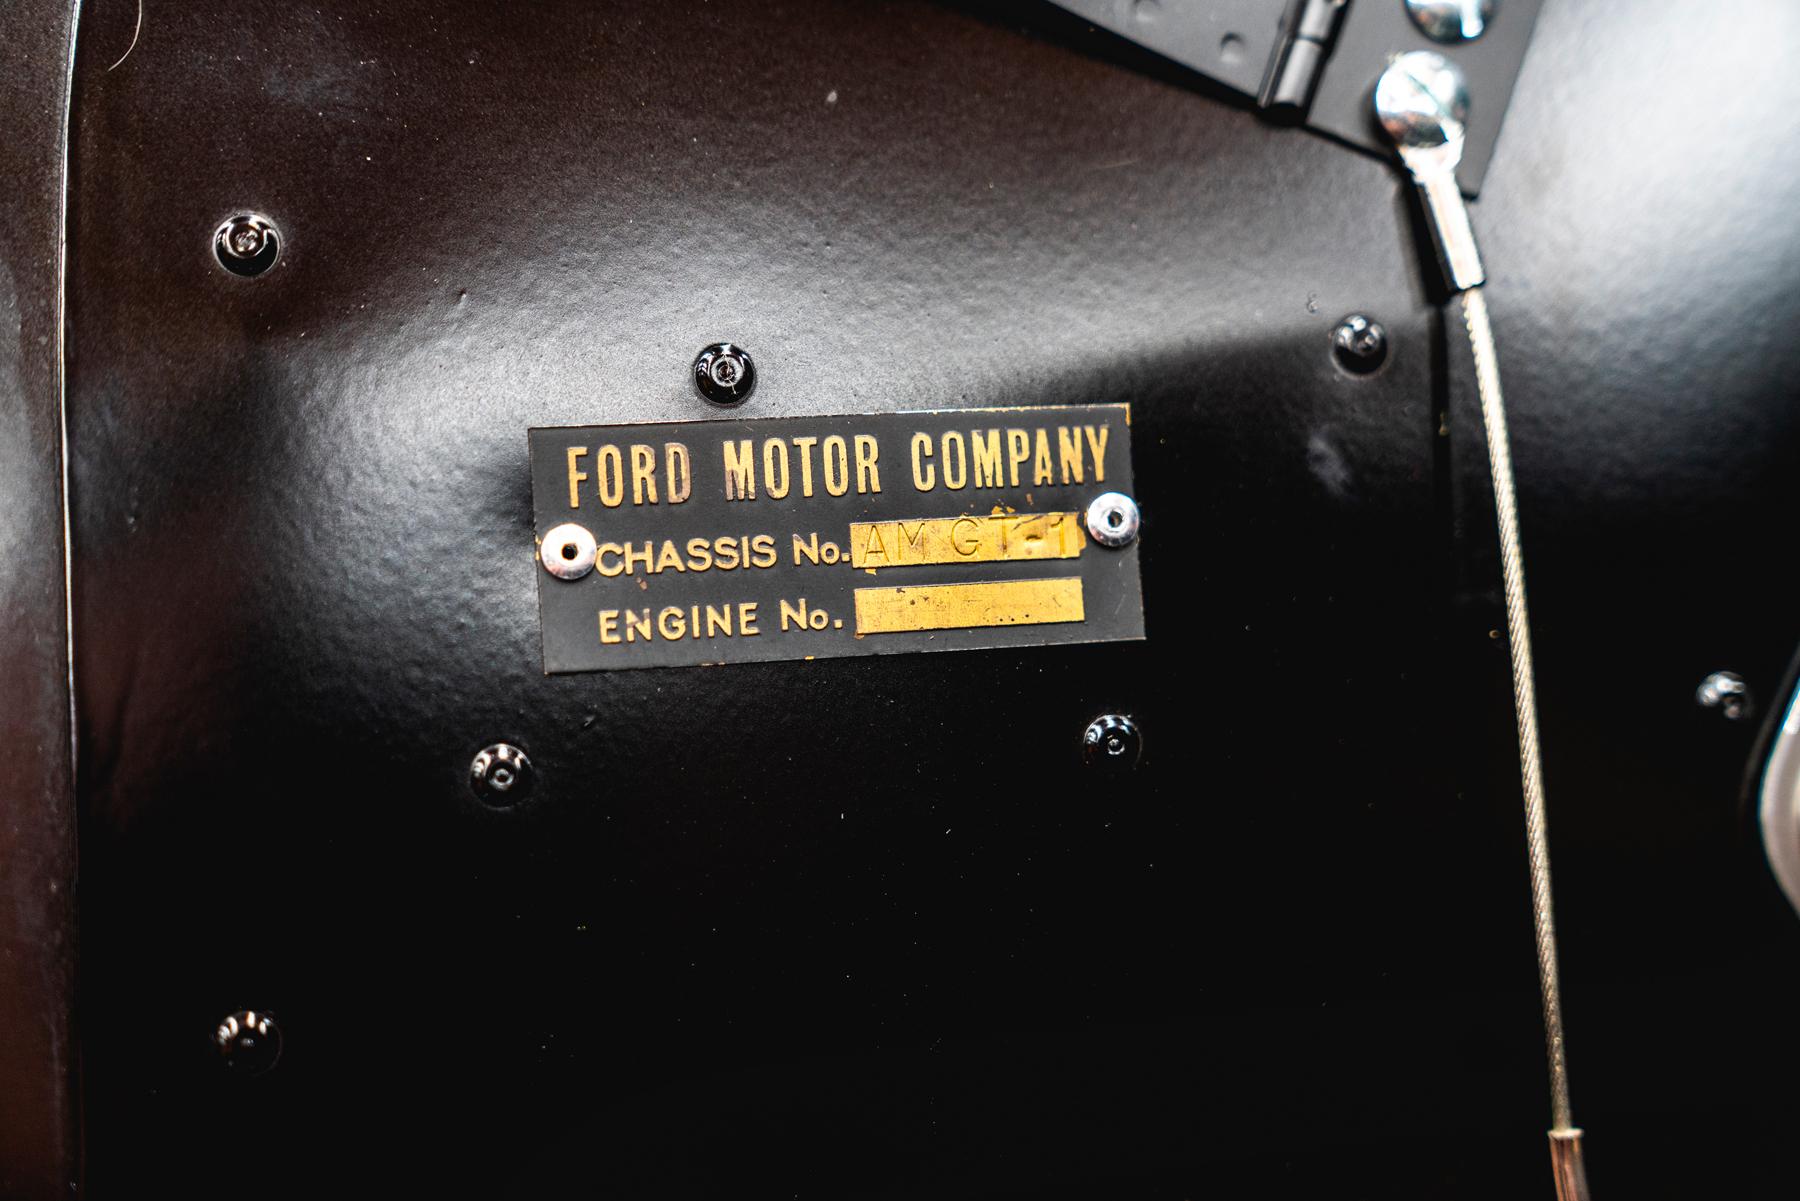 1966_Ford_GT40_Alan_Mann placard